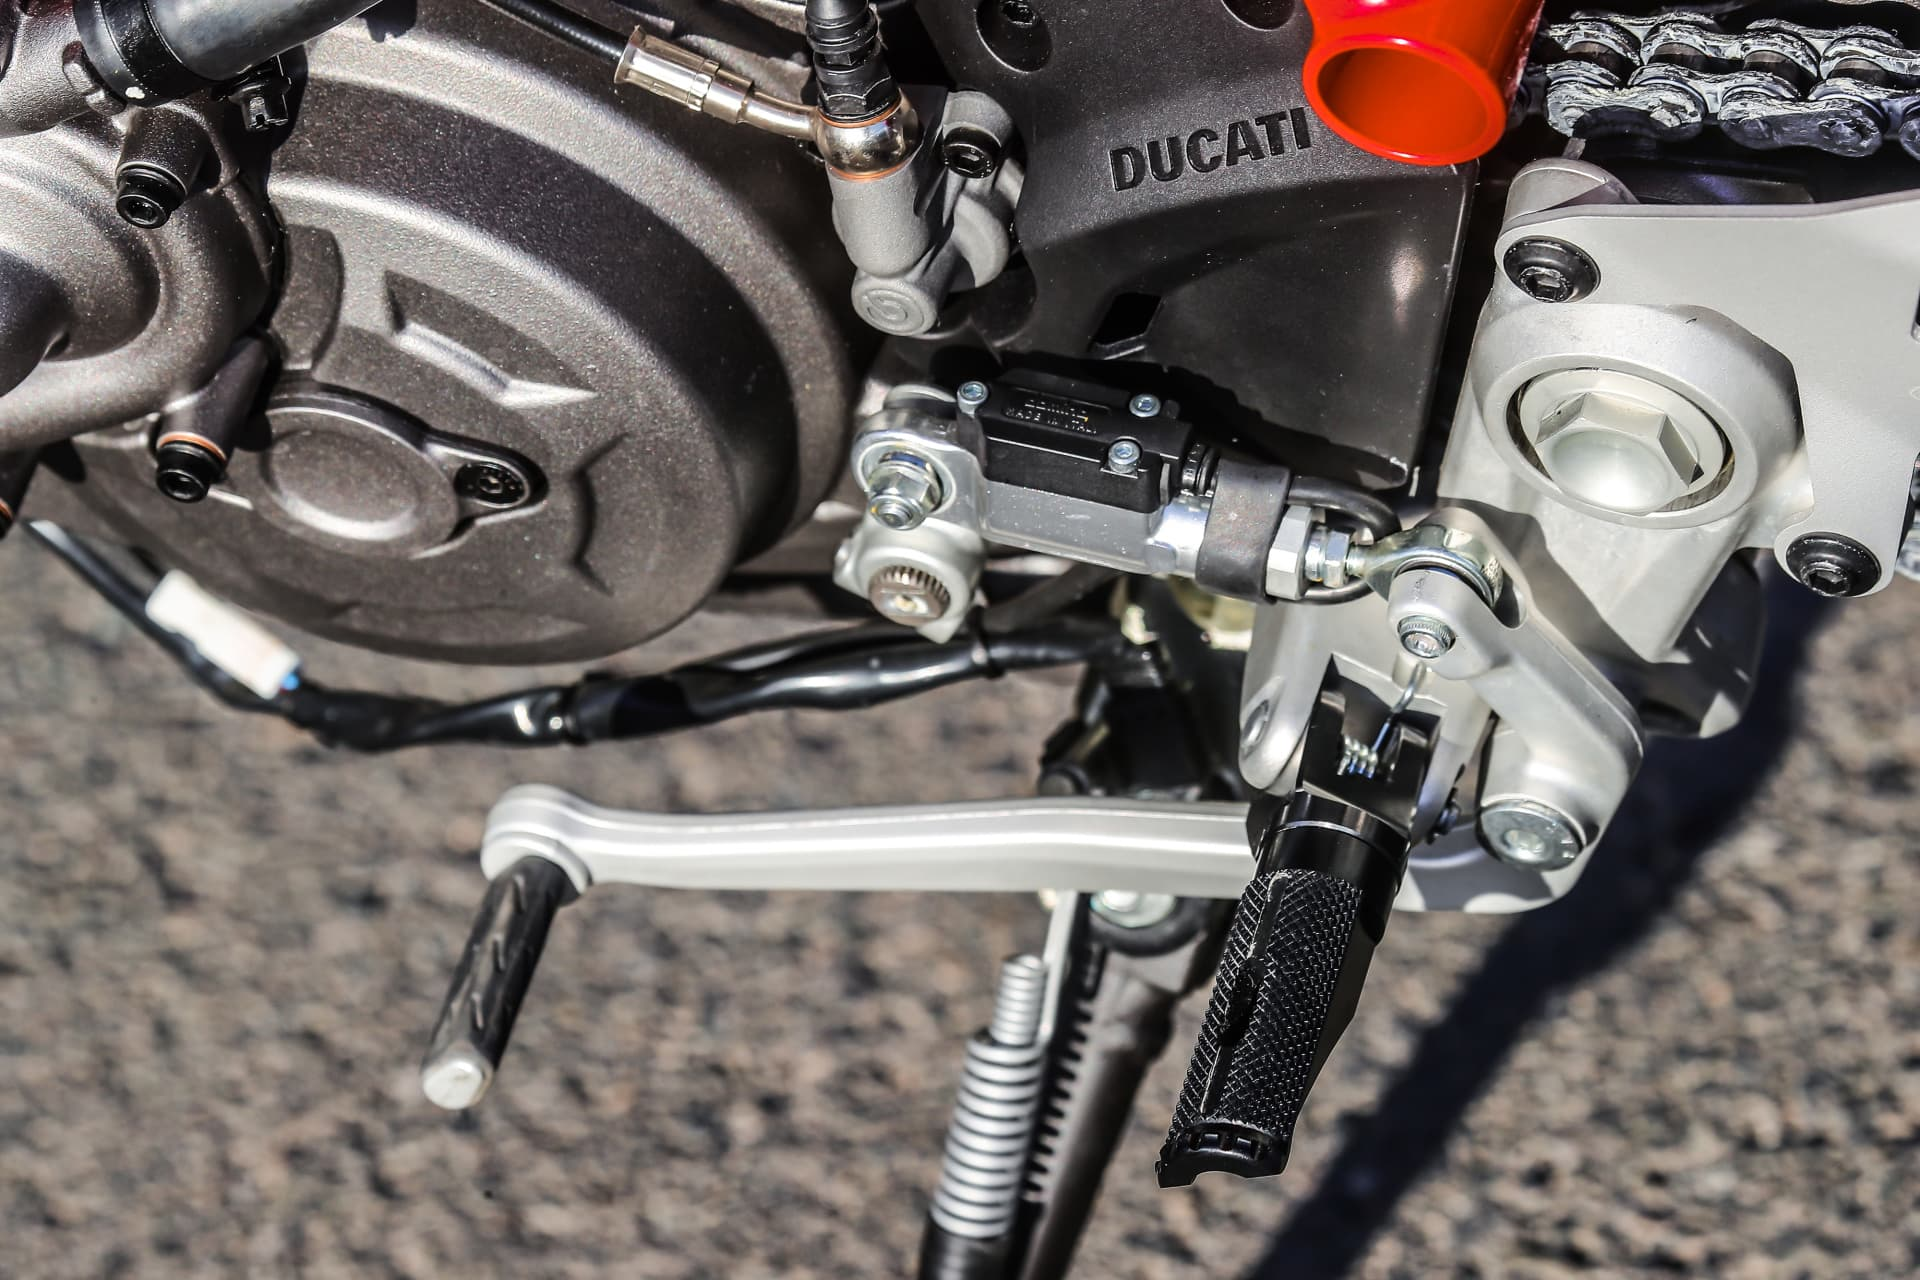 Ducati Hypermotard 950 Sp Static 31 Uc70293 Mid